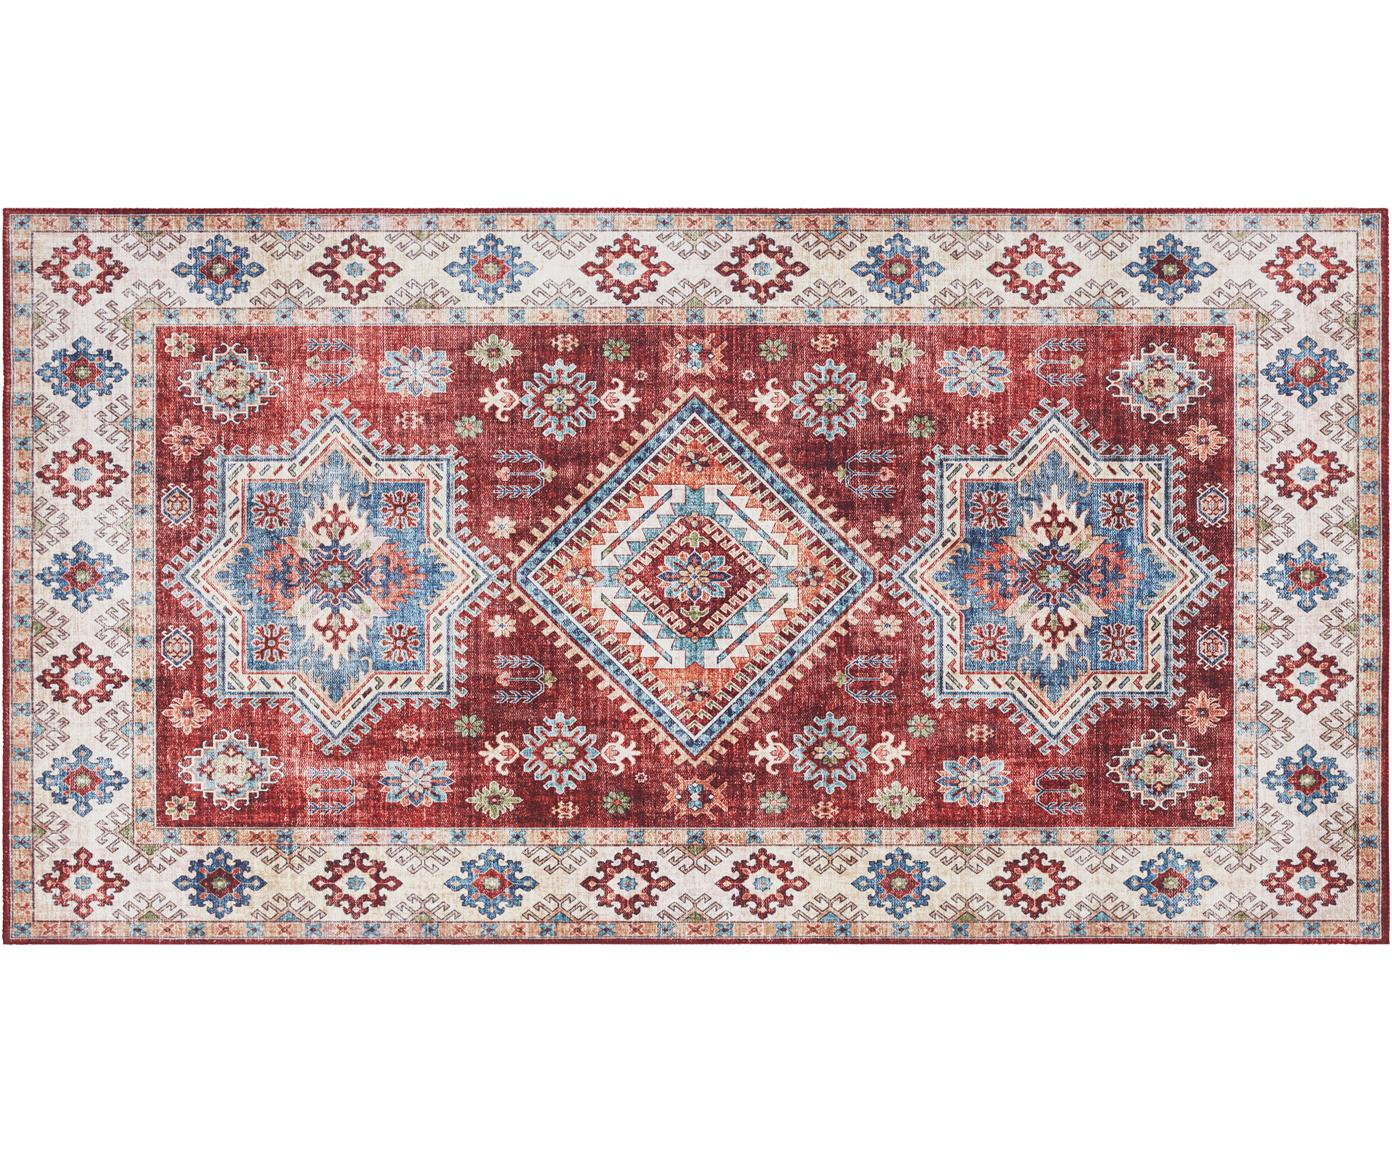 Teppich Gratia im Vintage Style, Rubinrot, Blau, B 80 x L 150 cm (Grösse XS)